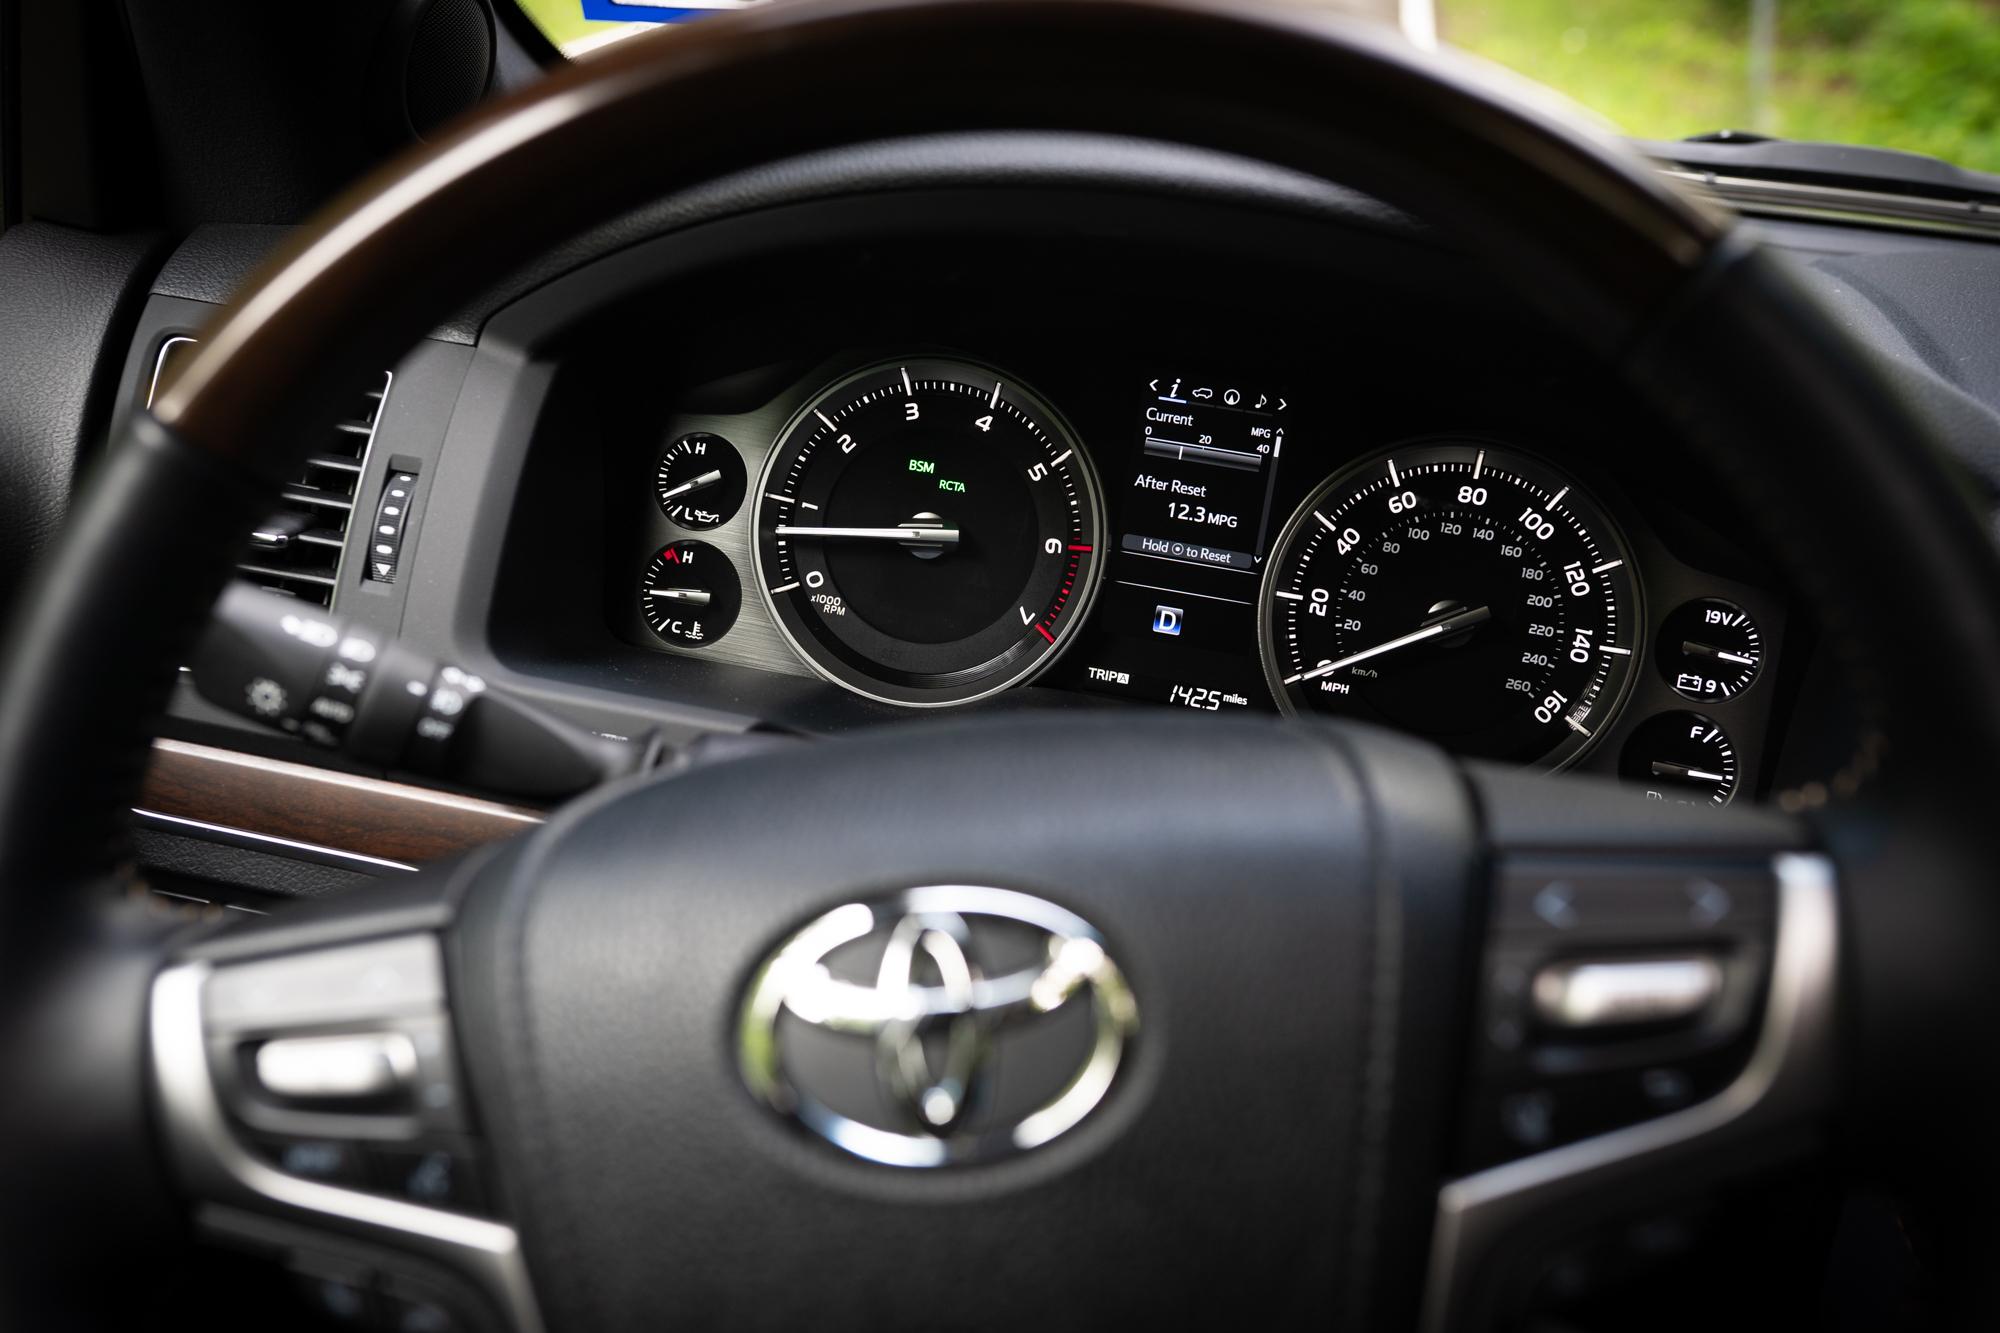 Toyota Land Cruiser Dash Digital Gauges